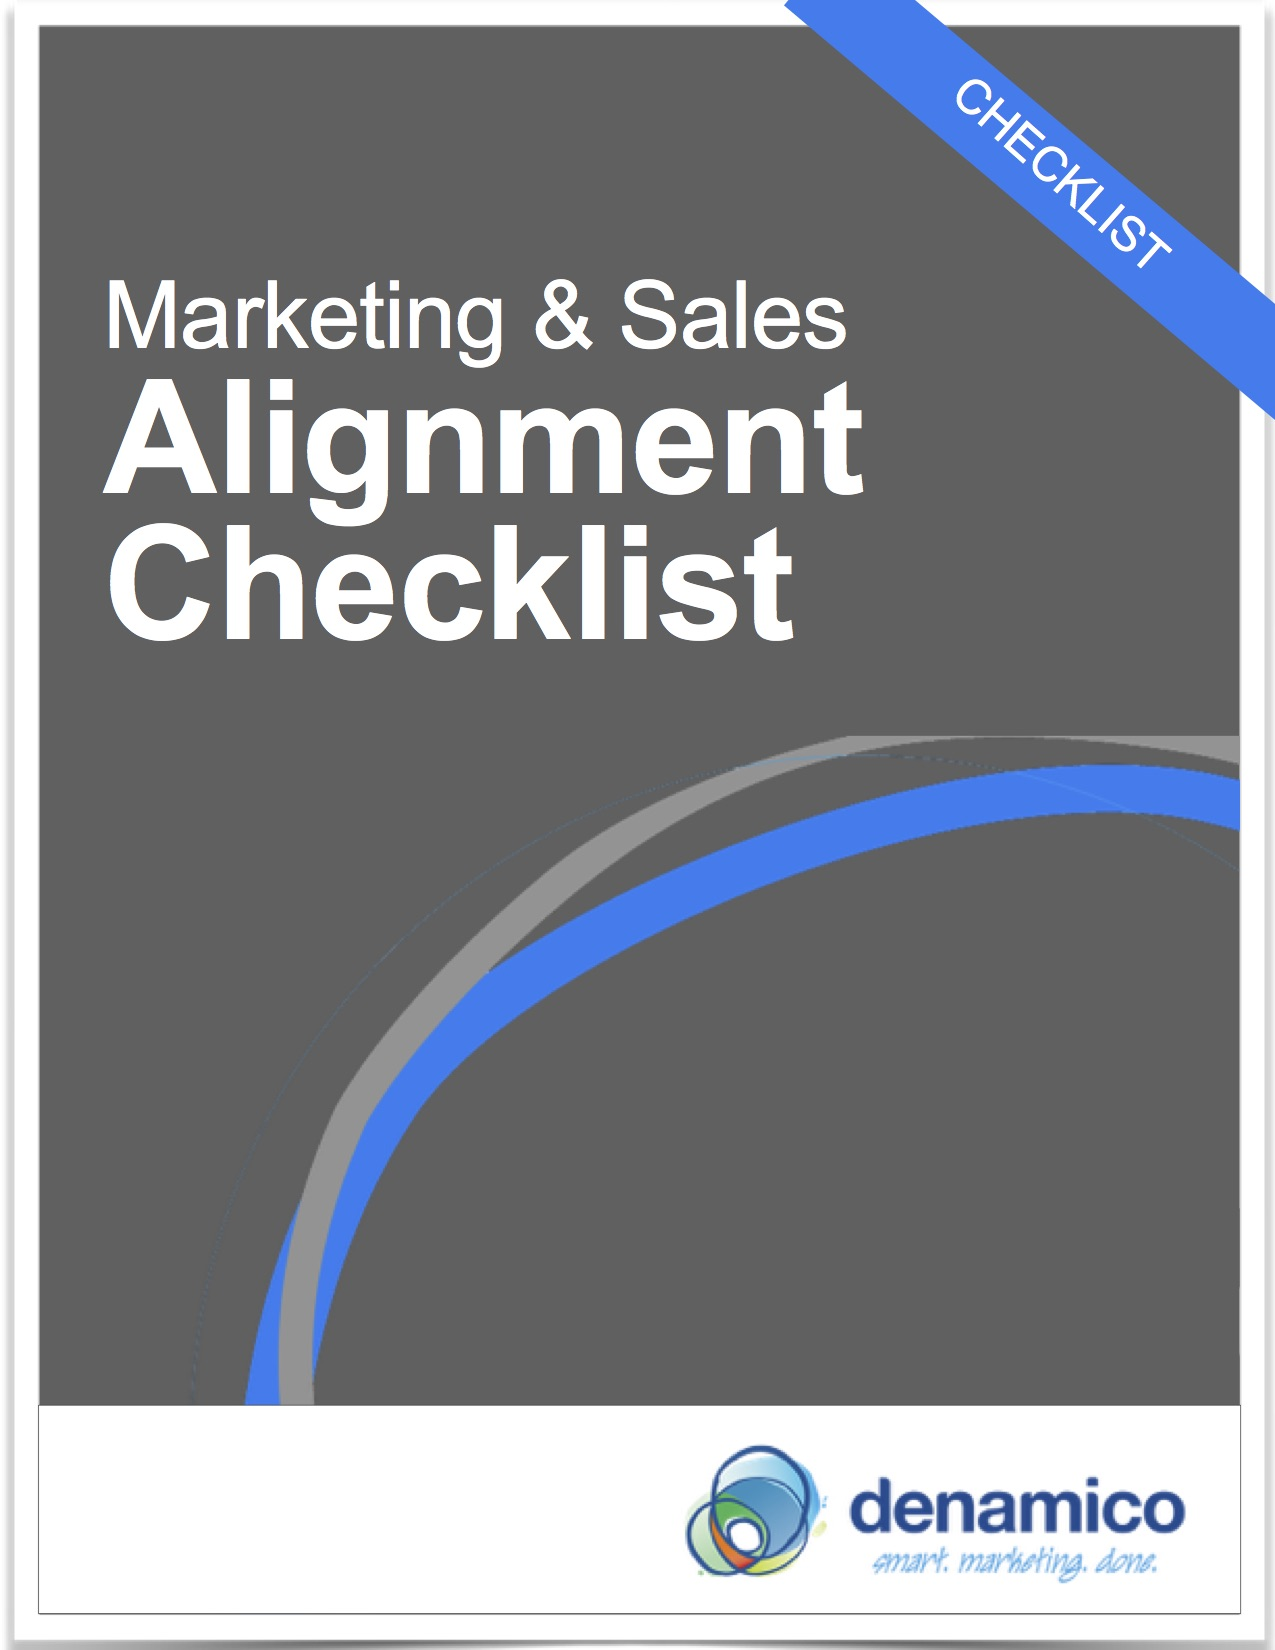 marketing and sales alignment checklist ebook cover